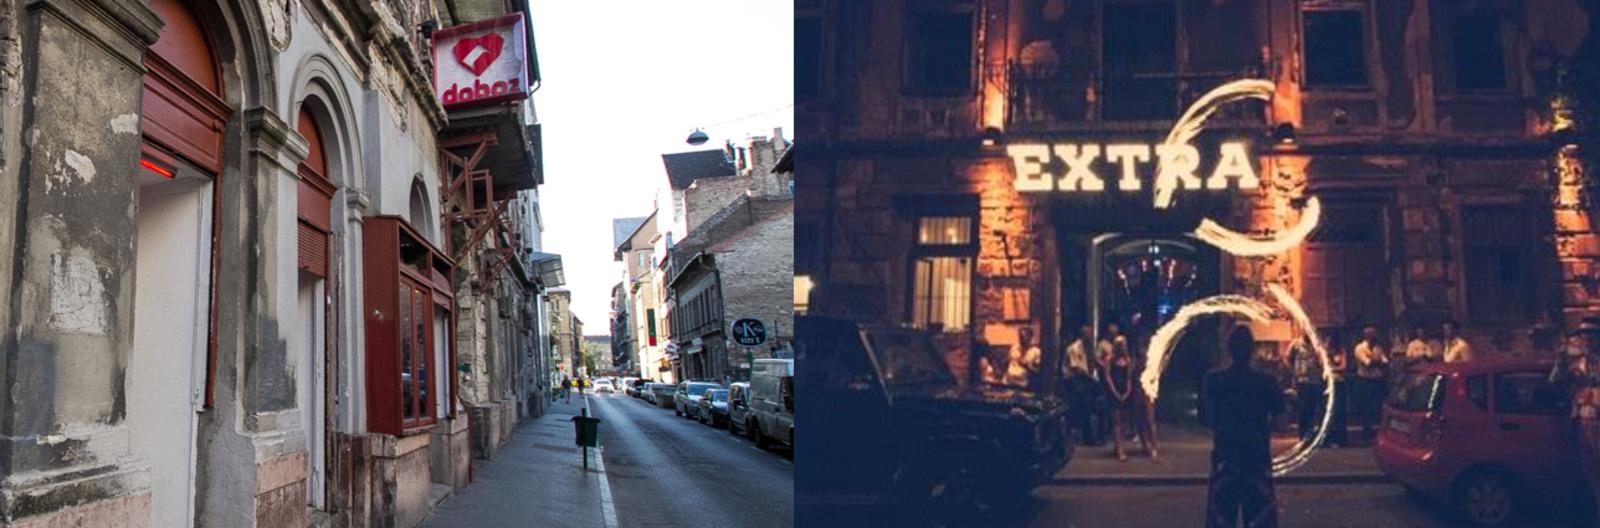 District VII's Klauzál Street is a day-and-night Budapest hotspot